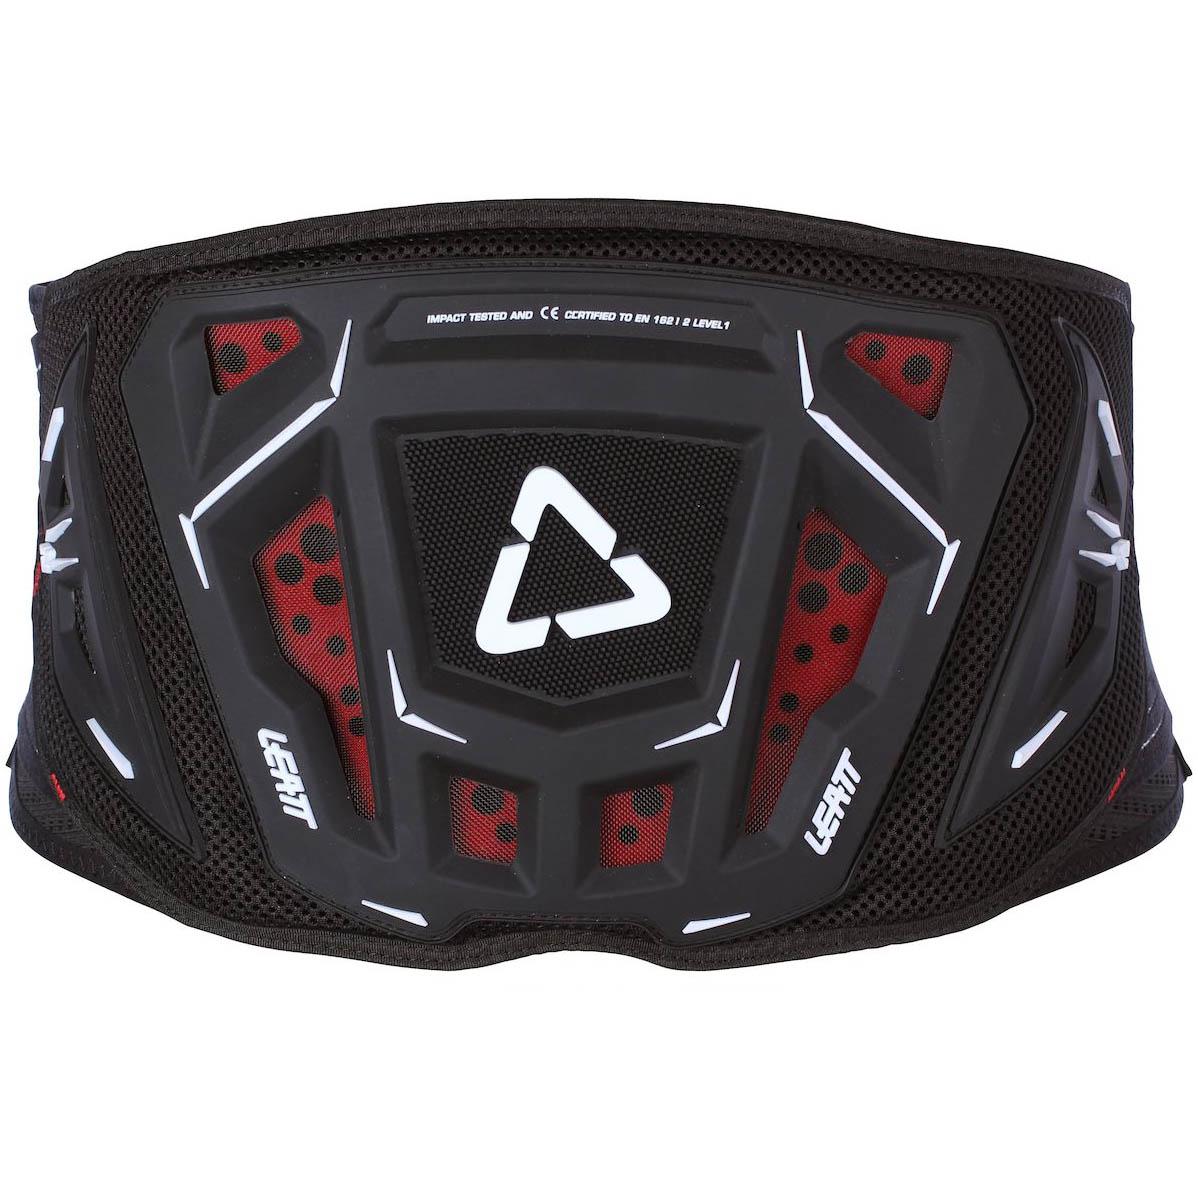 Leatt - 2018 3DF Kidney Belt Black защитный жилет, черный